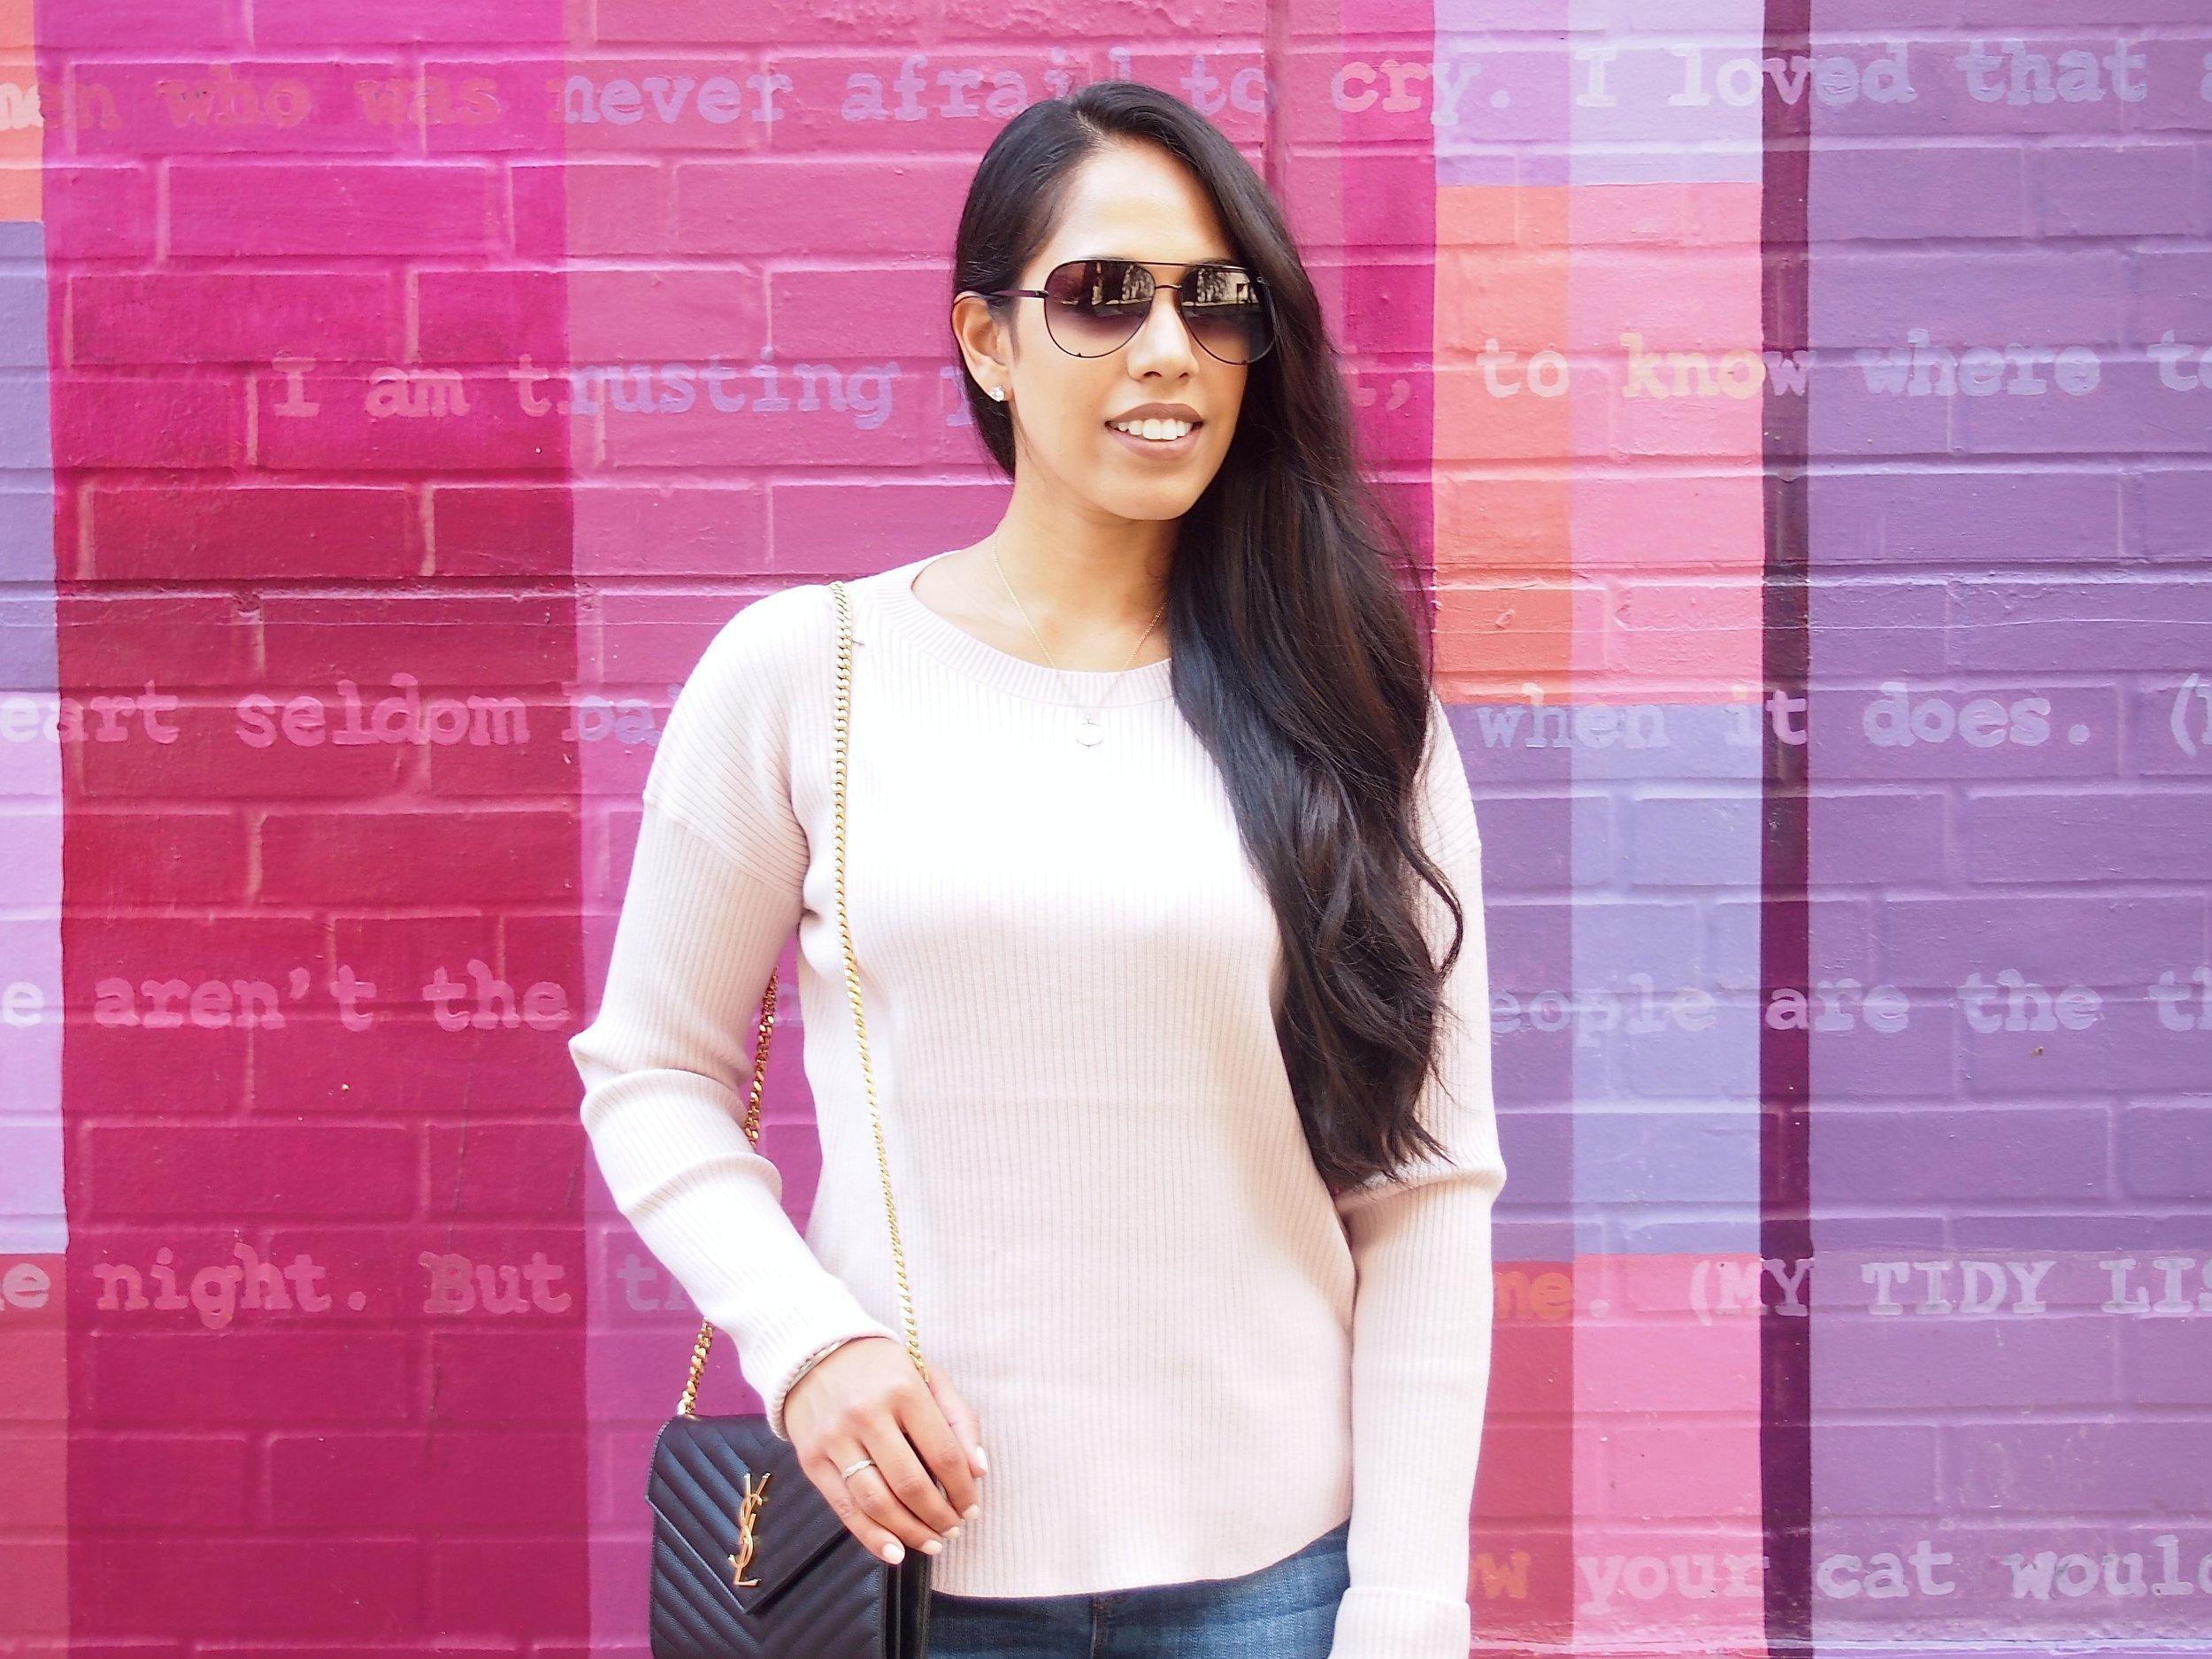 fashion-blogger-quay-sunglasses-mygoldenbeauty.jpg